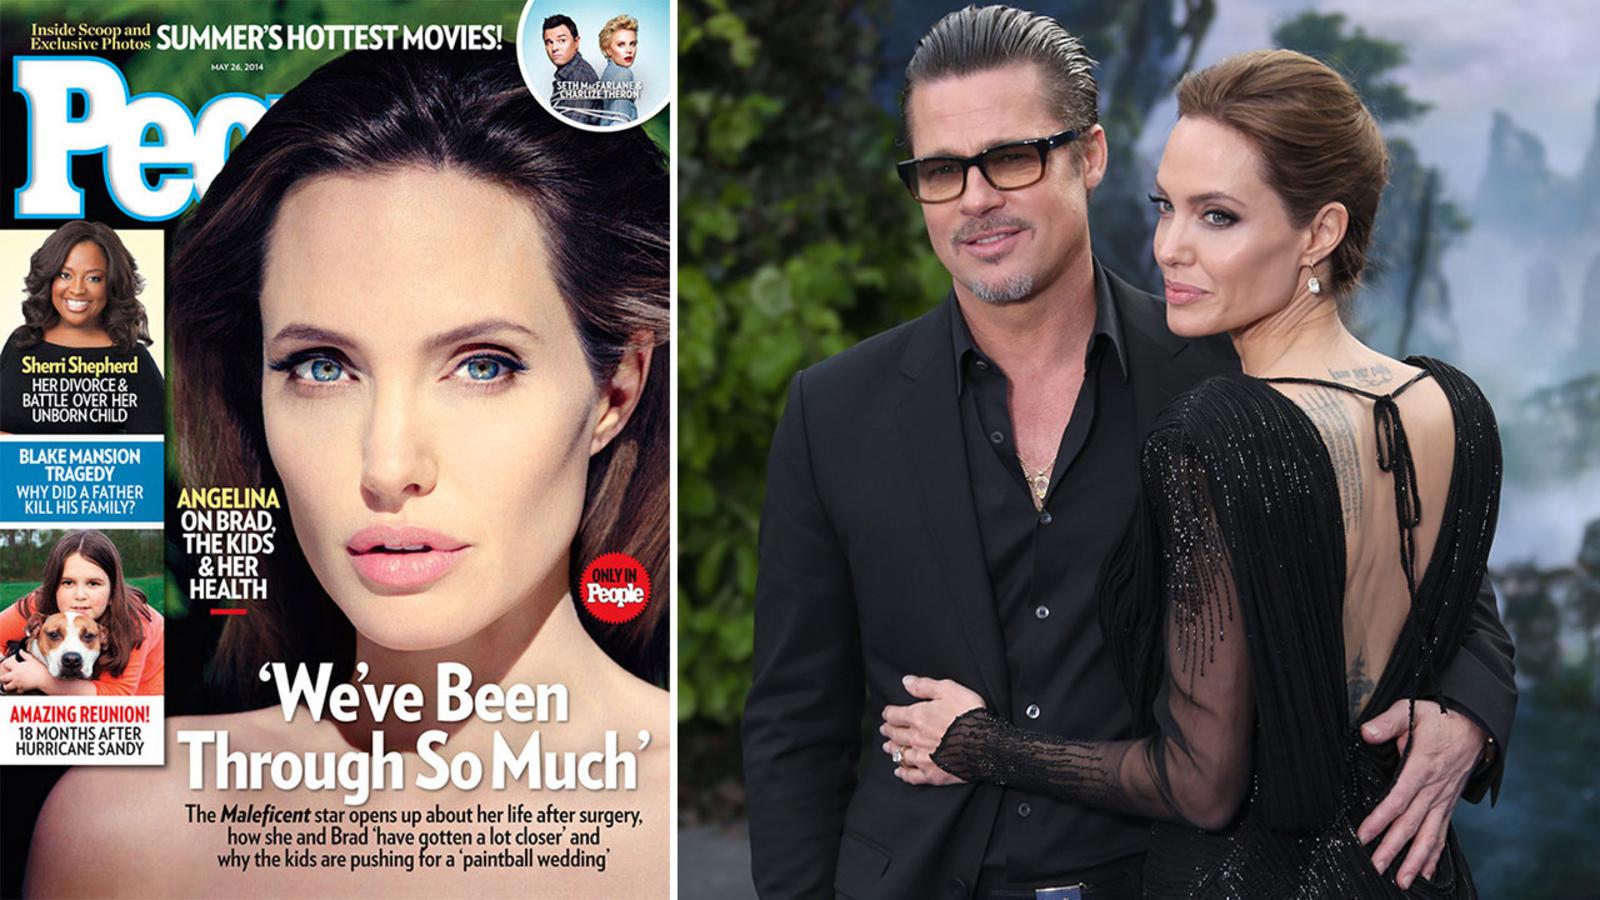 Angelina Jolie And Brad Pitt To Have Disney Wedding Actress Talks Kids Involvement Abc7 Los Angeles